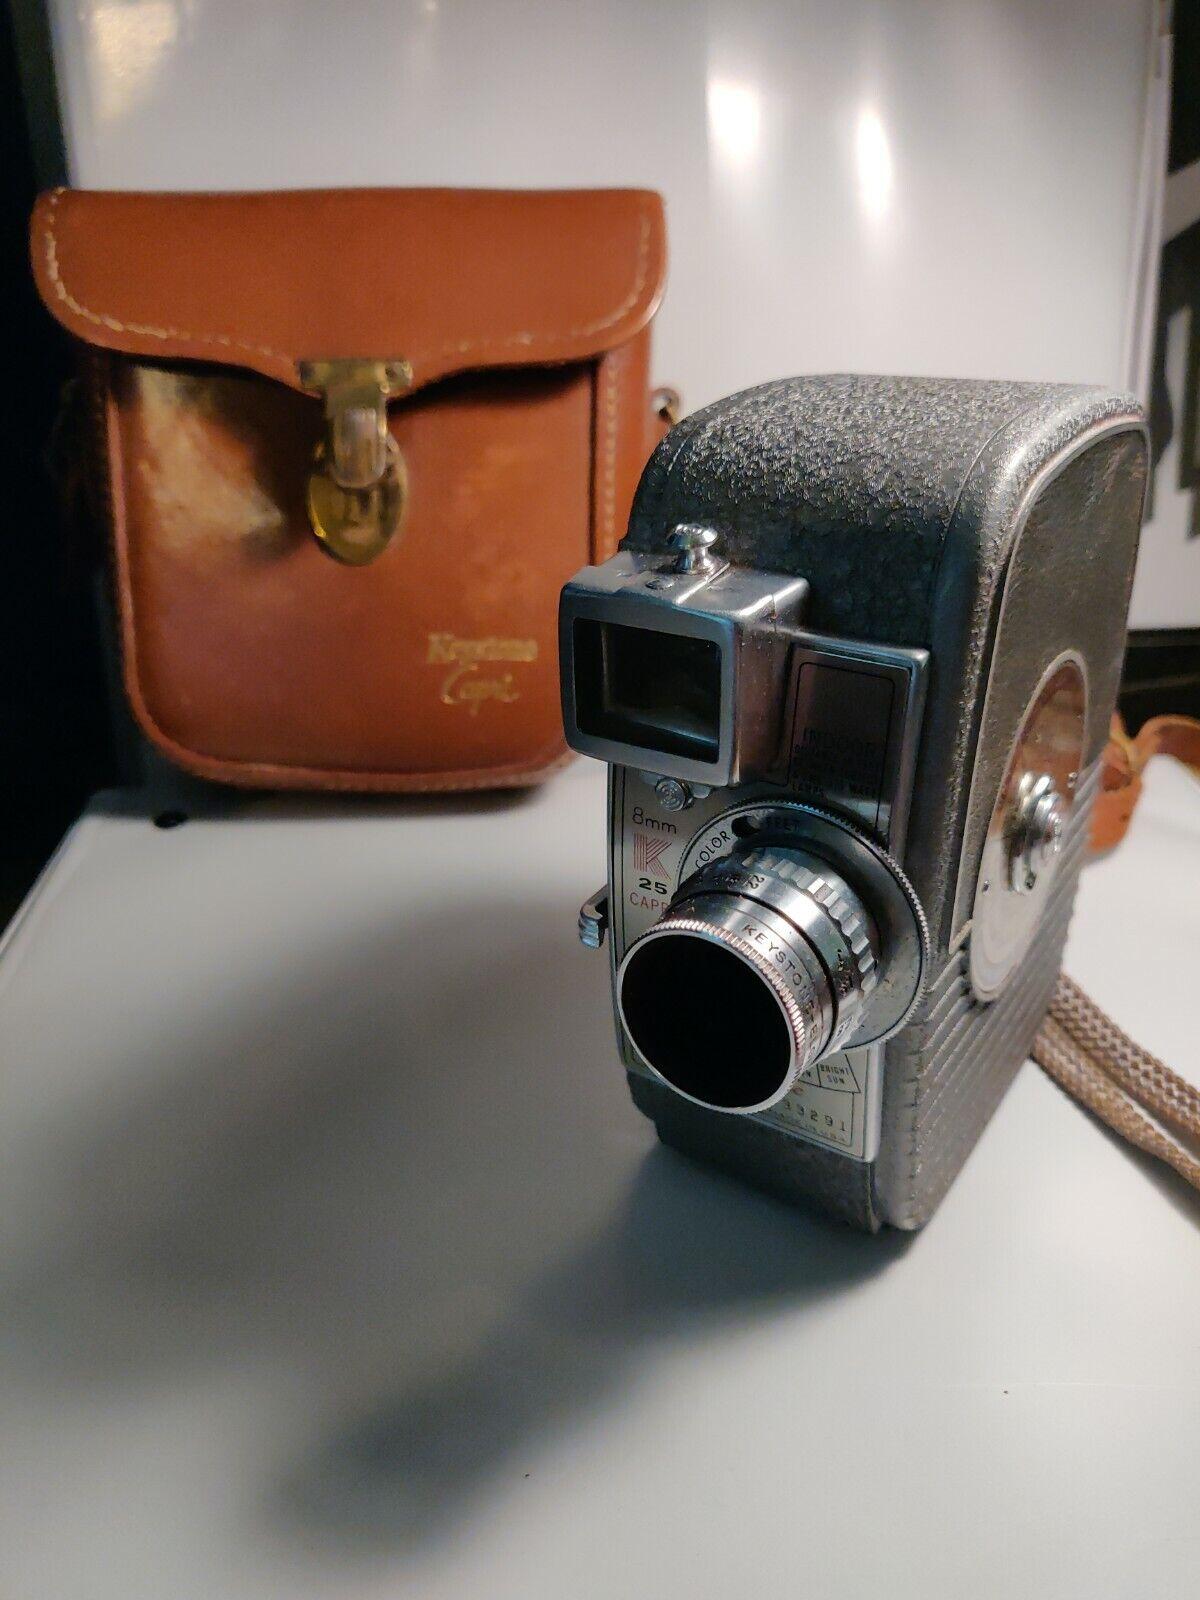 8Mm Vintage Camera keystone capri dial - o -matic vintage camera 8mm | ebay